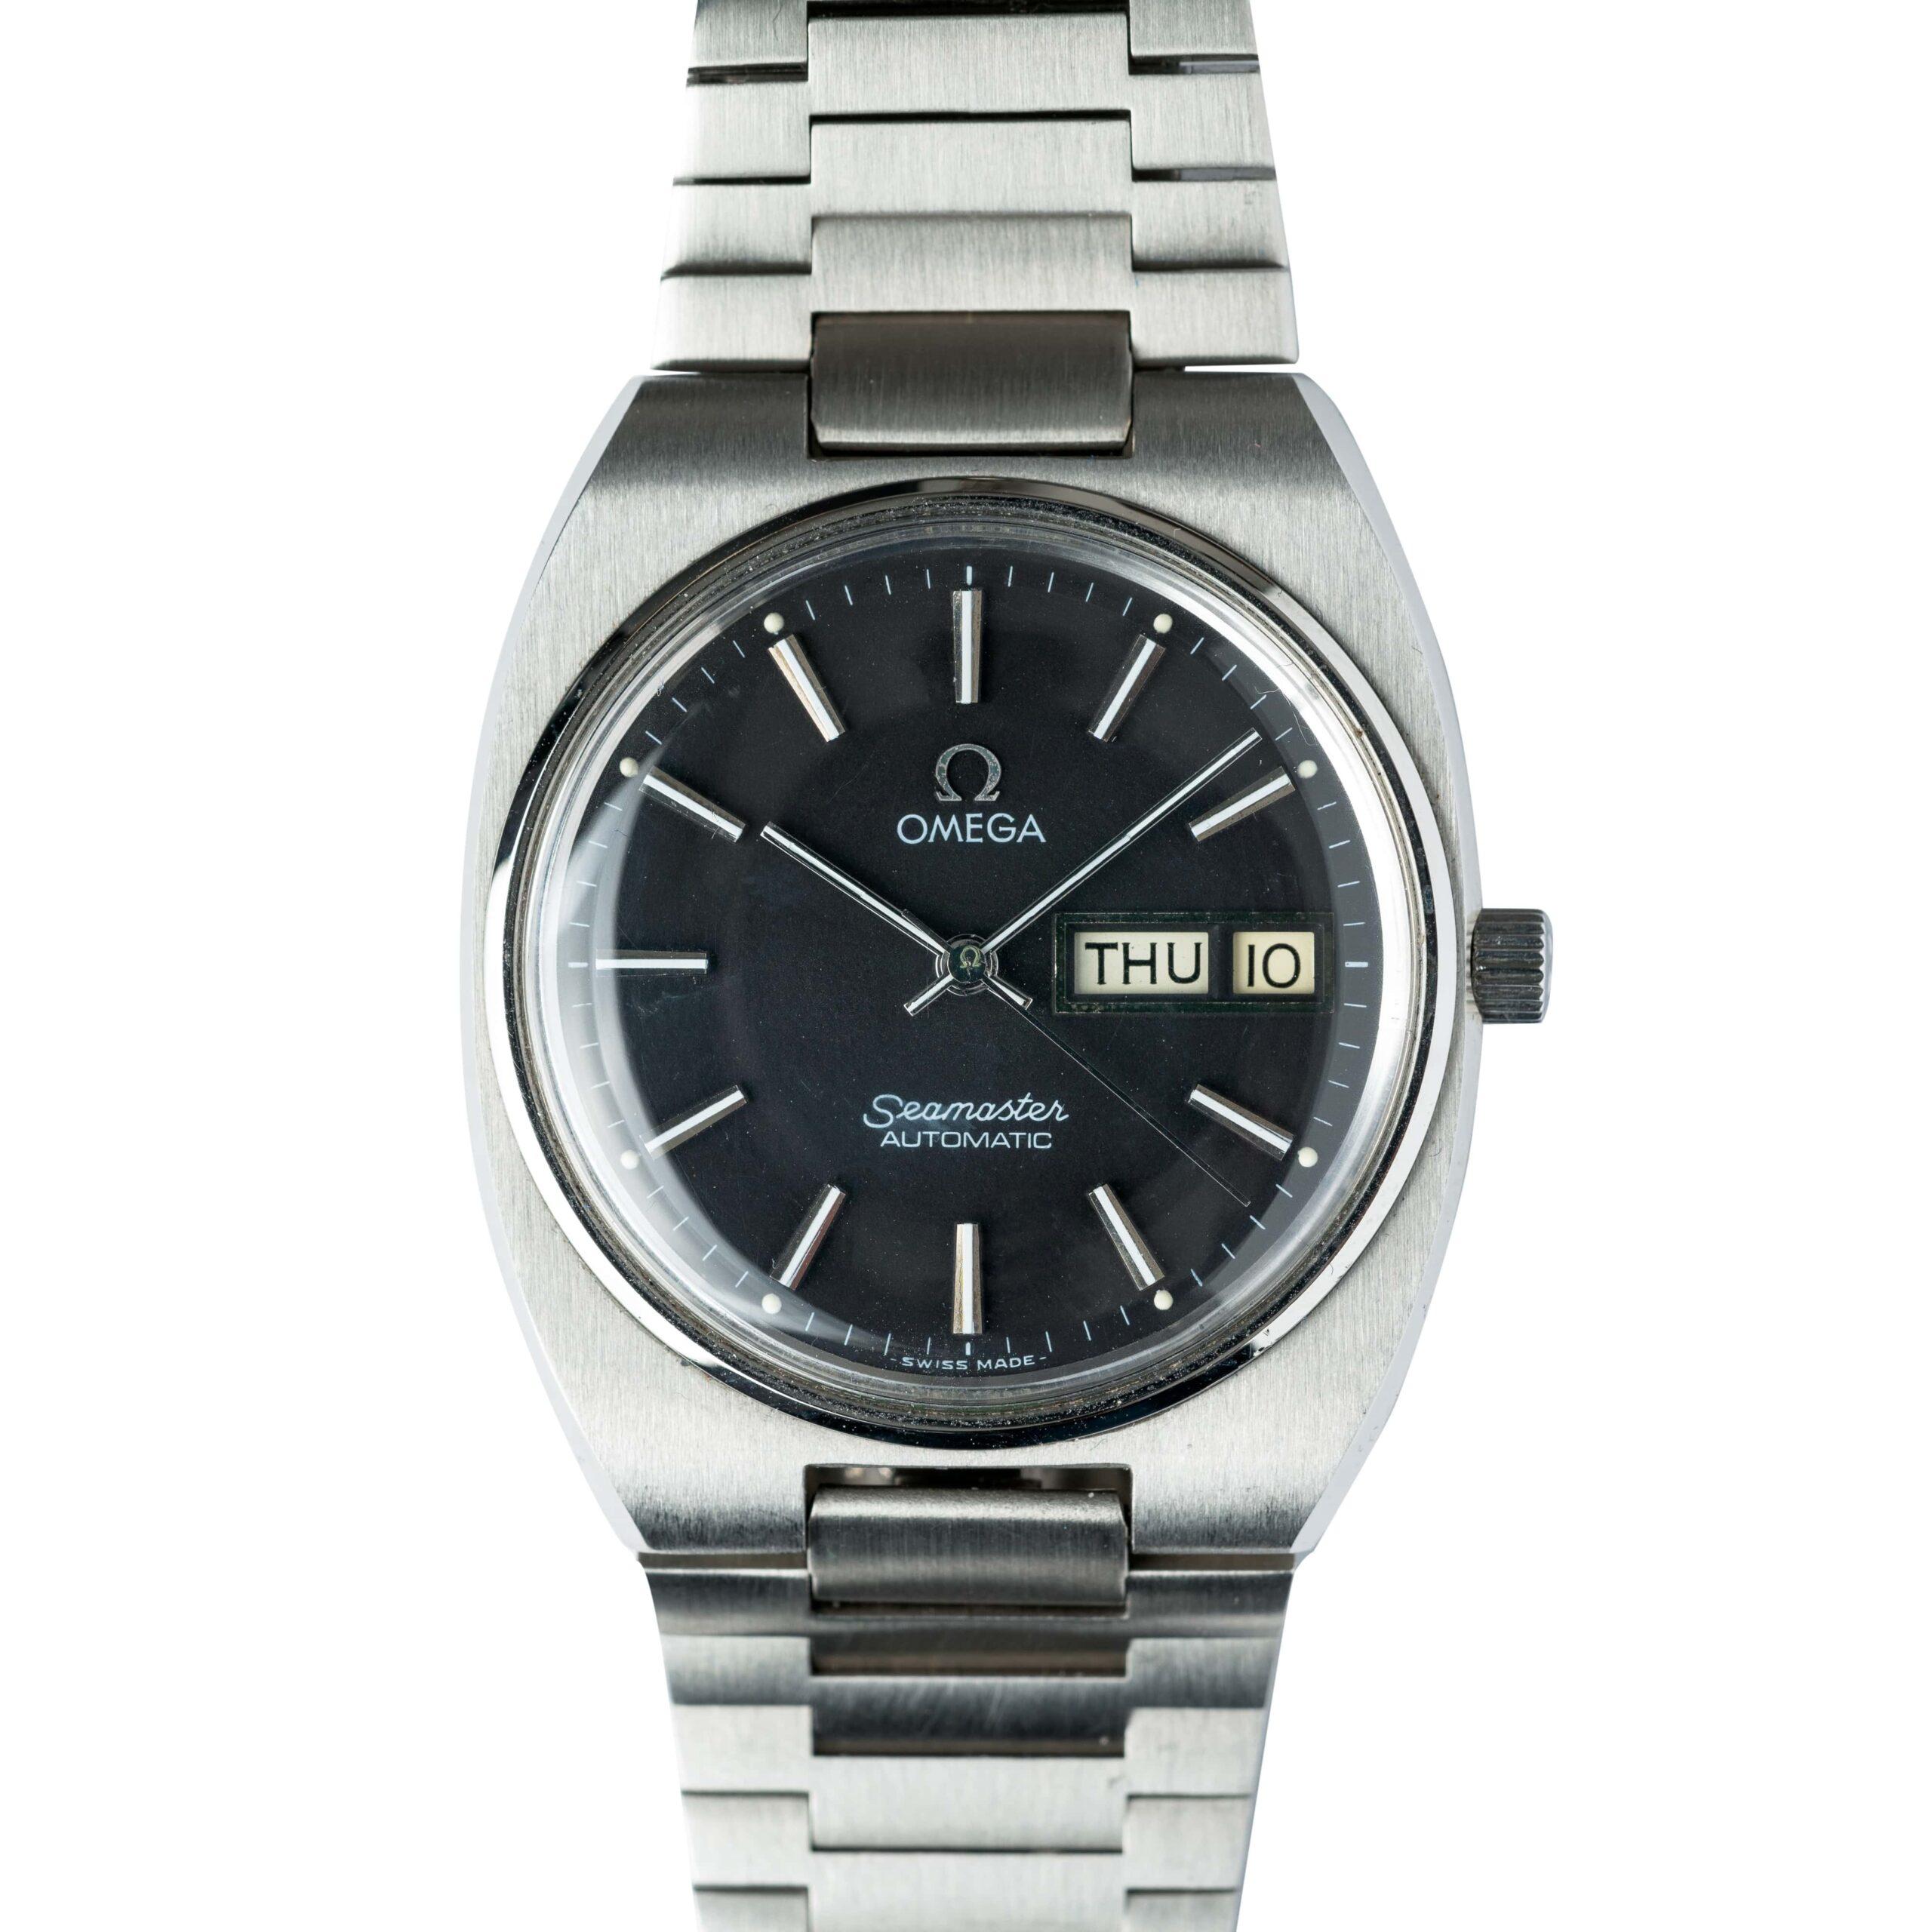 vintage Omega Seamaster 166.0216 watch